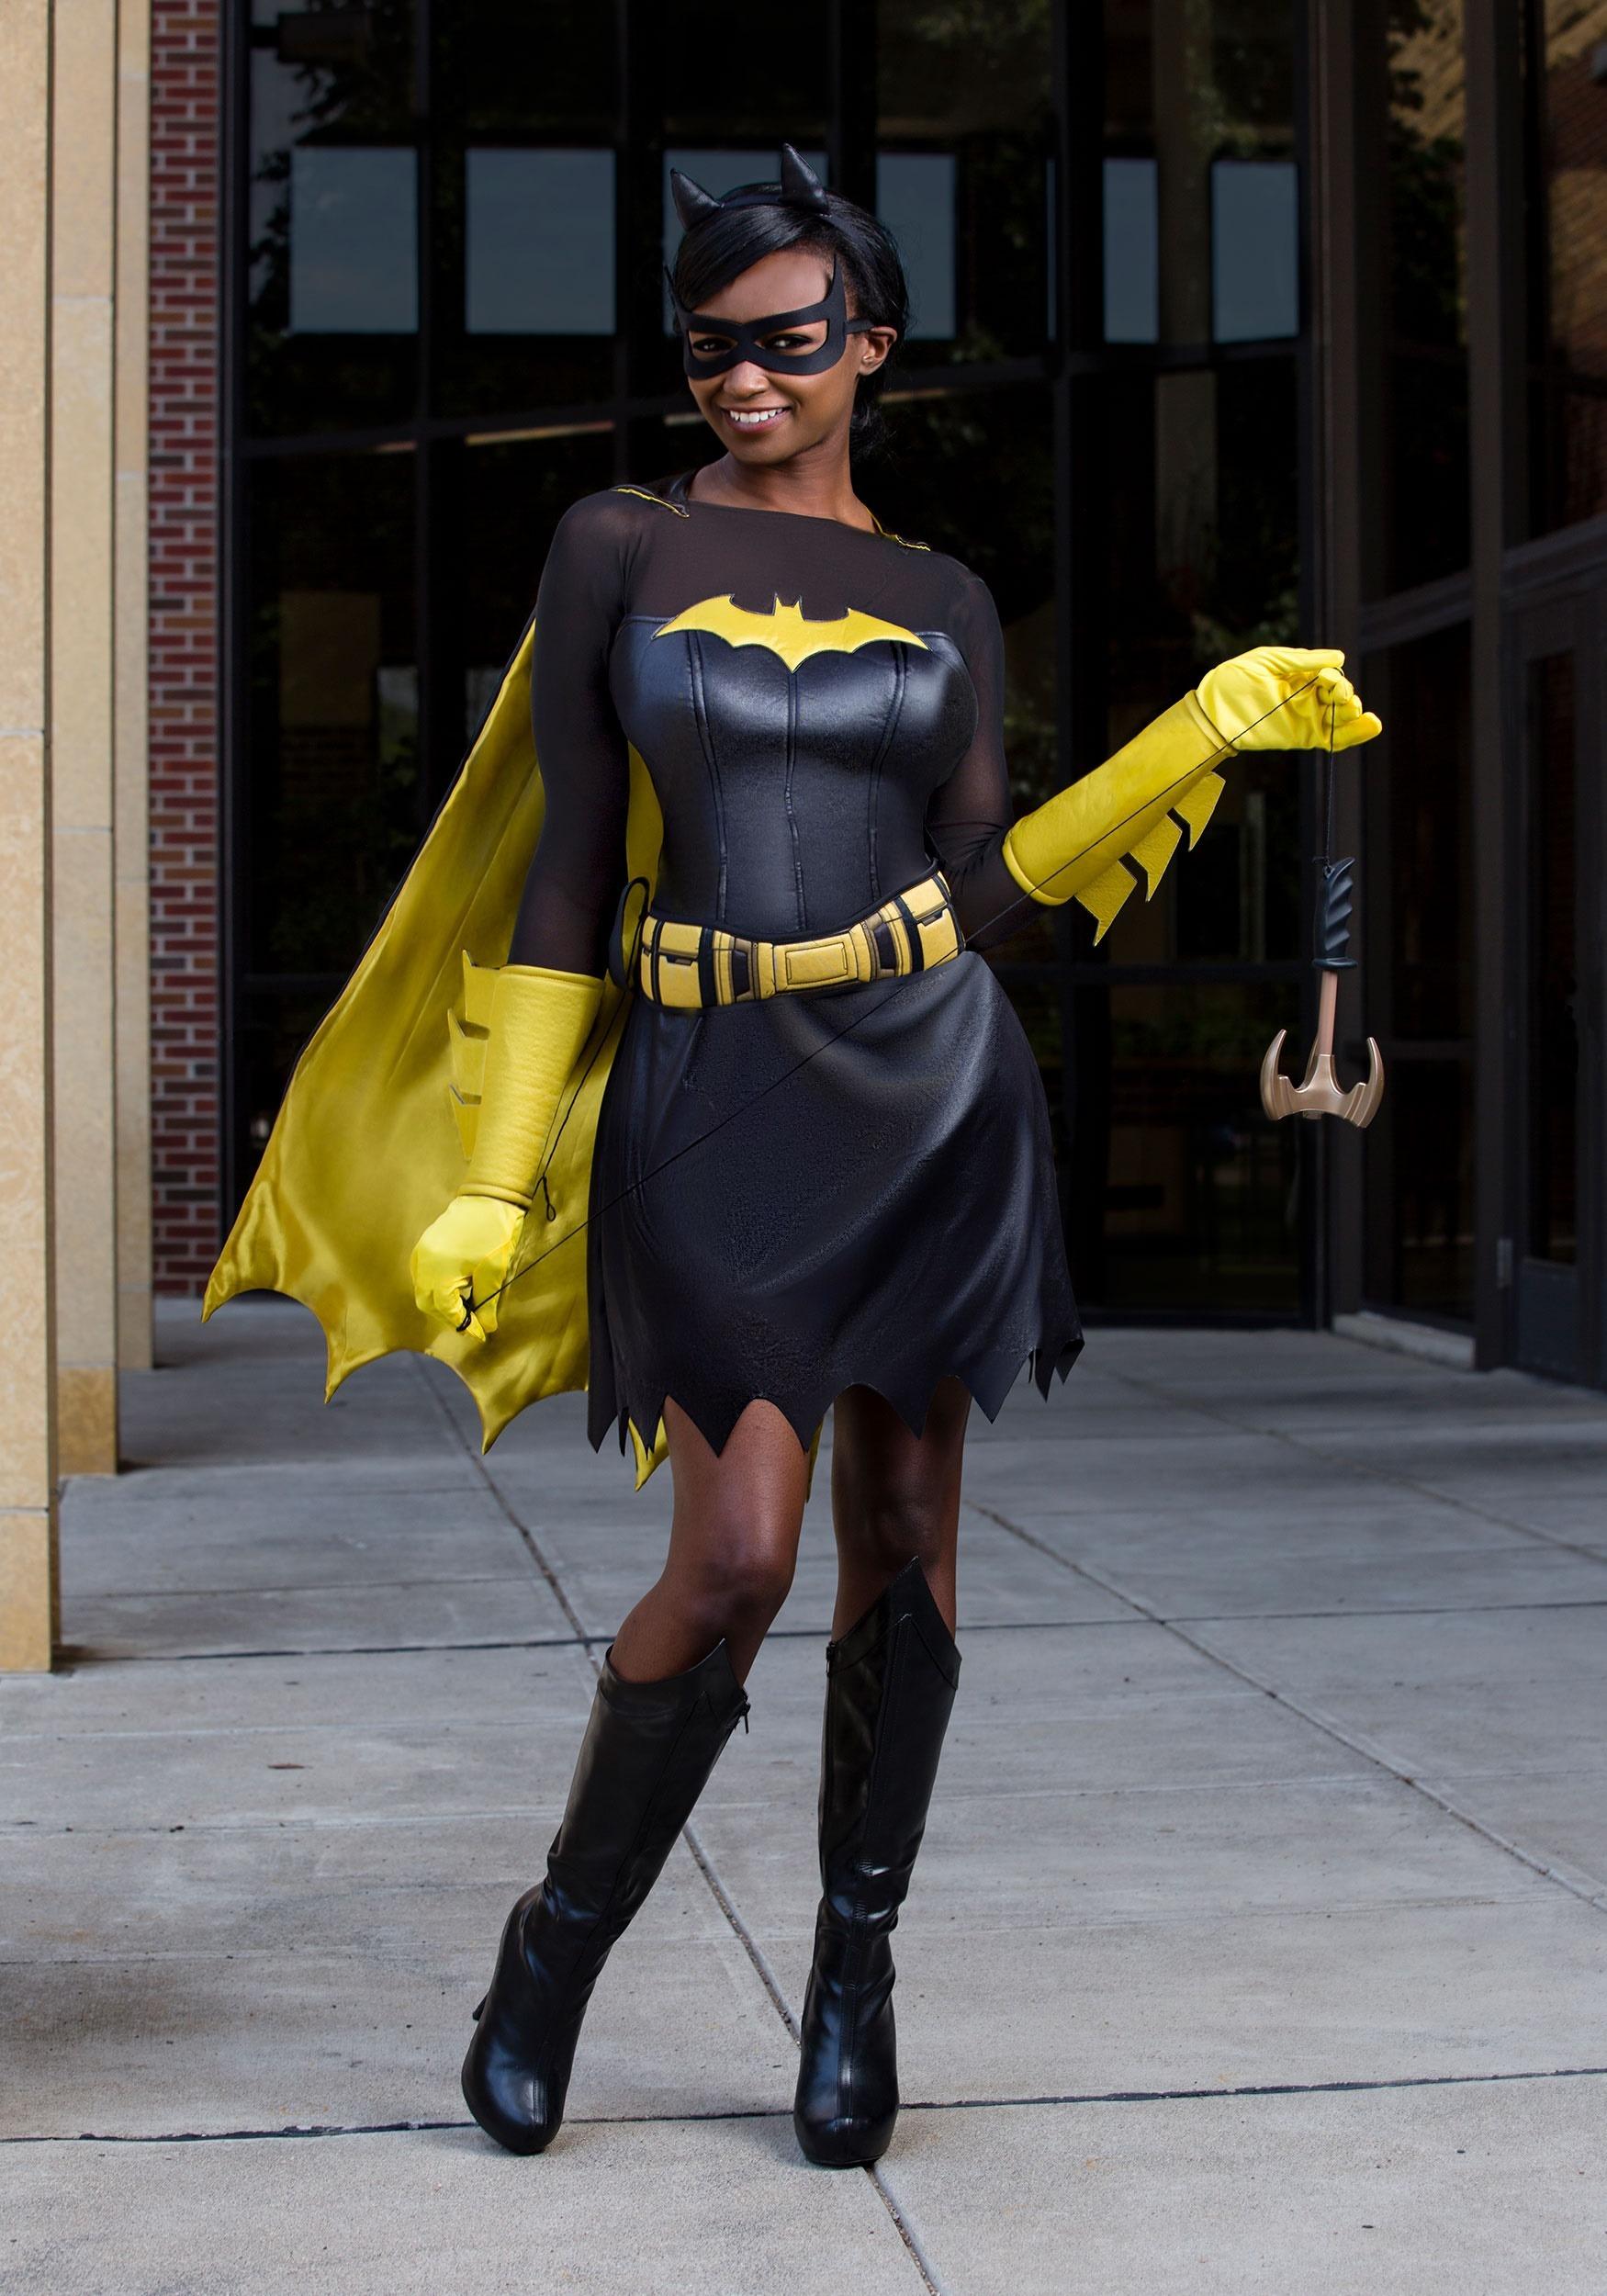 Dc Deluxe Batgirl Costume For Women